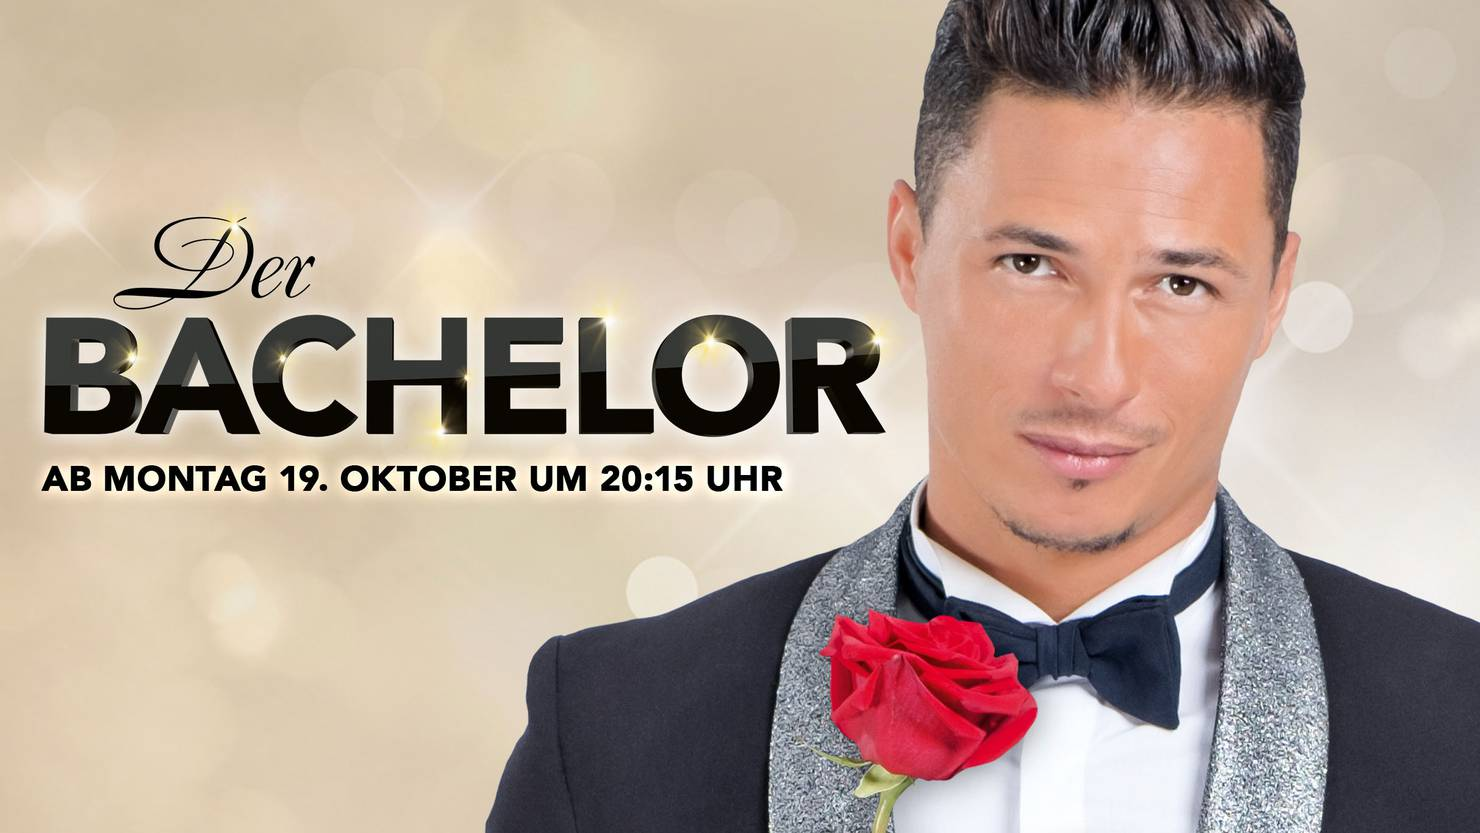 Der Bachelor Schweiz